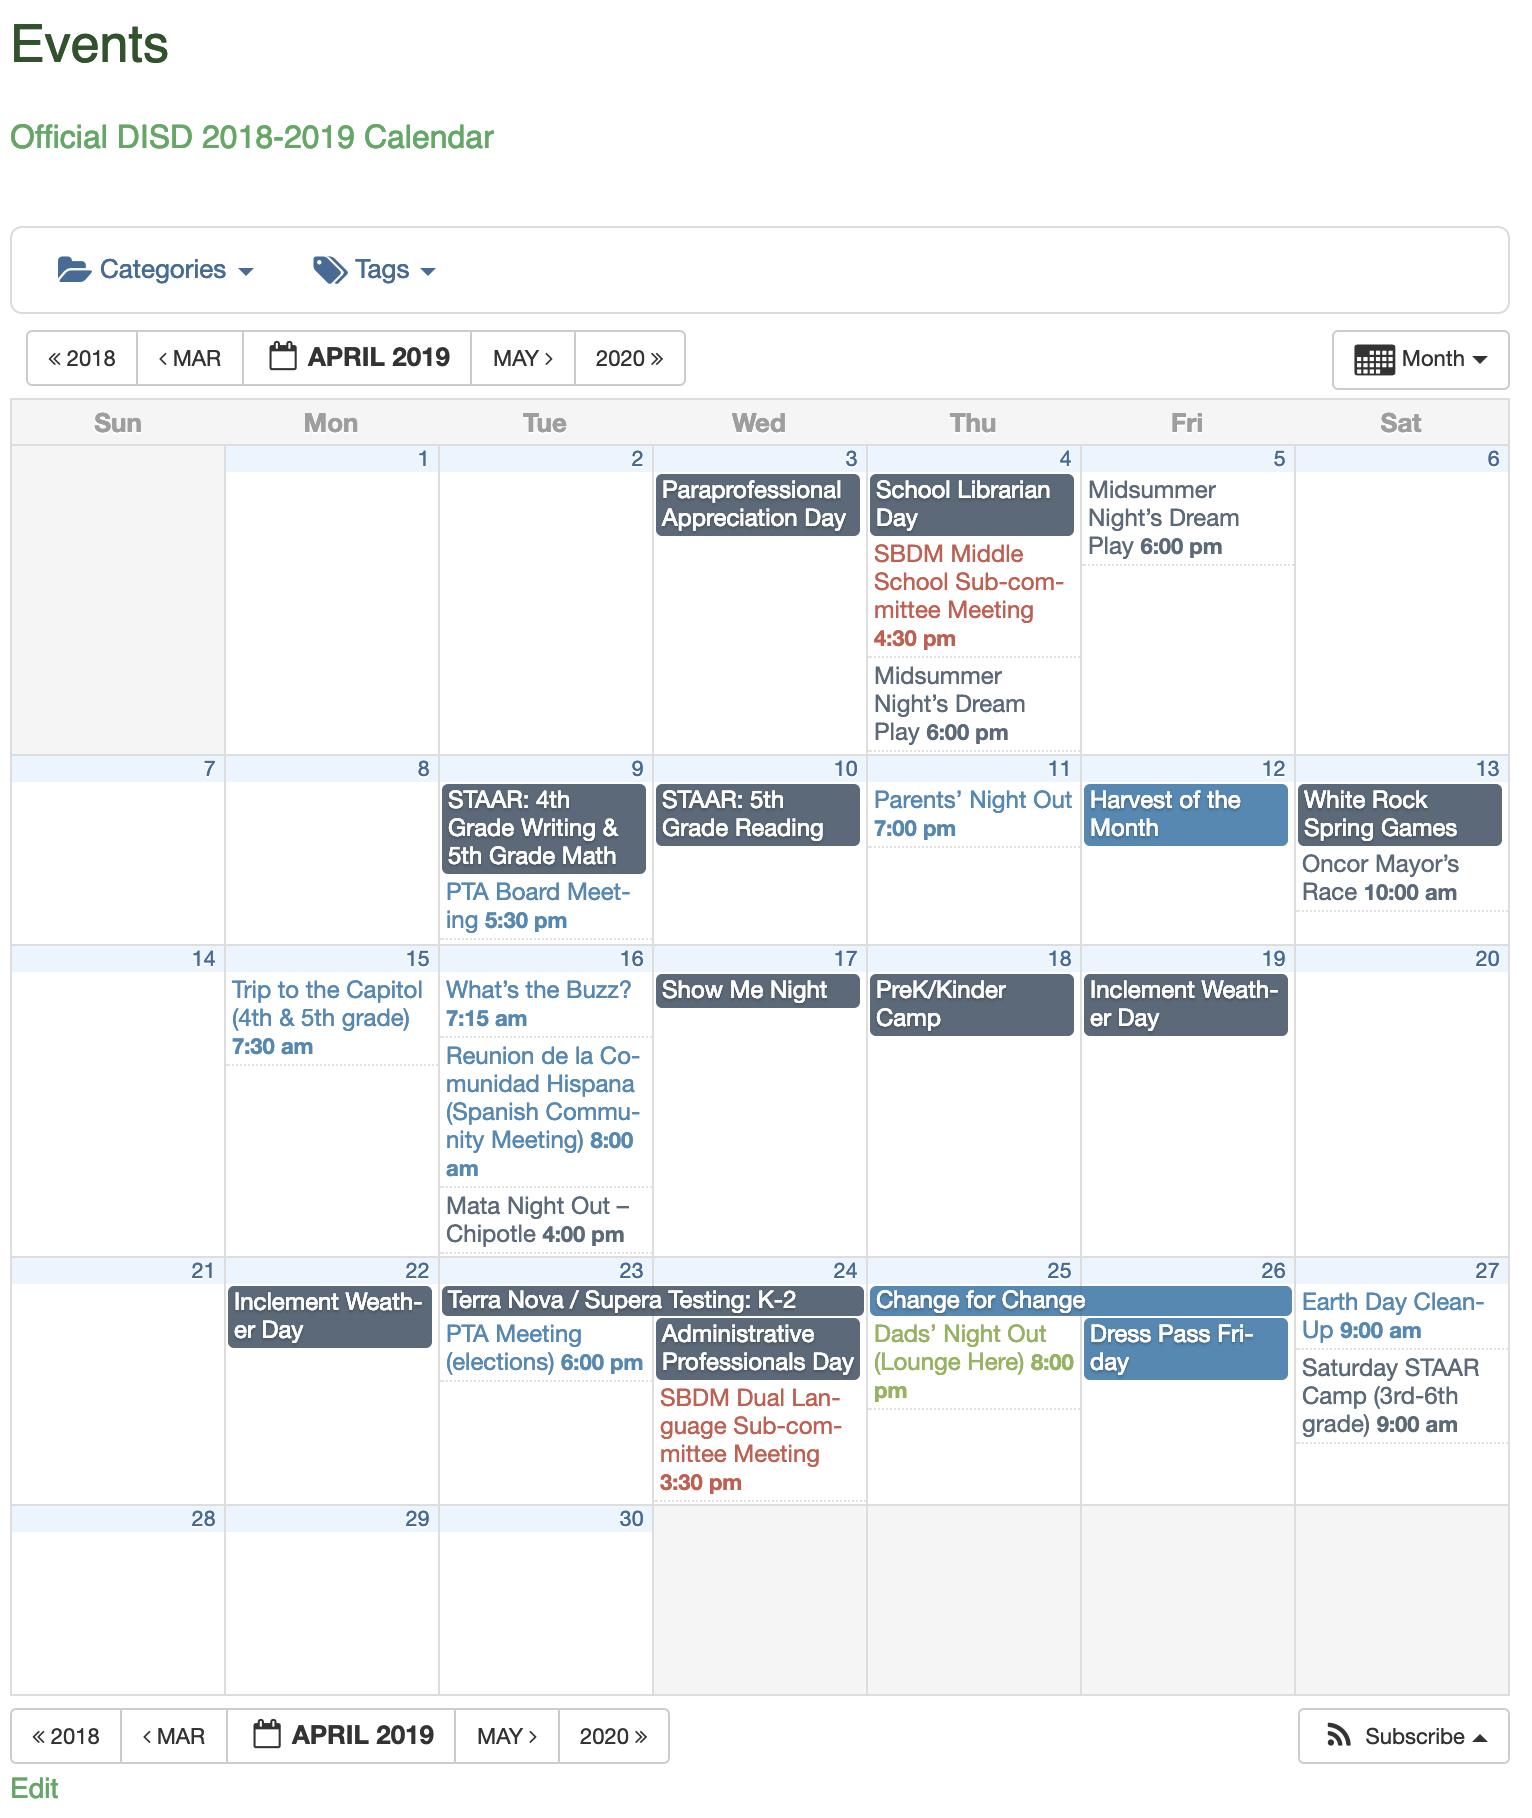 Full calendar of events >